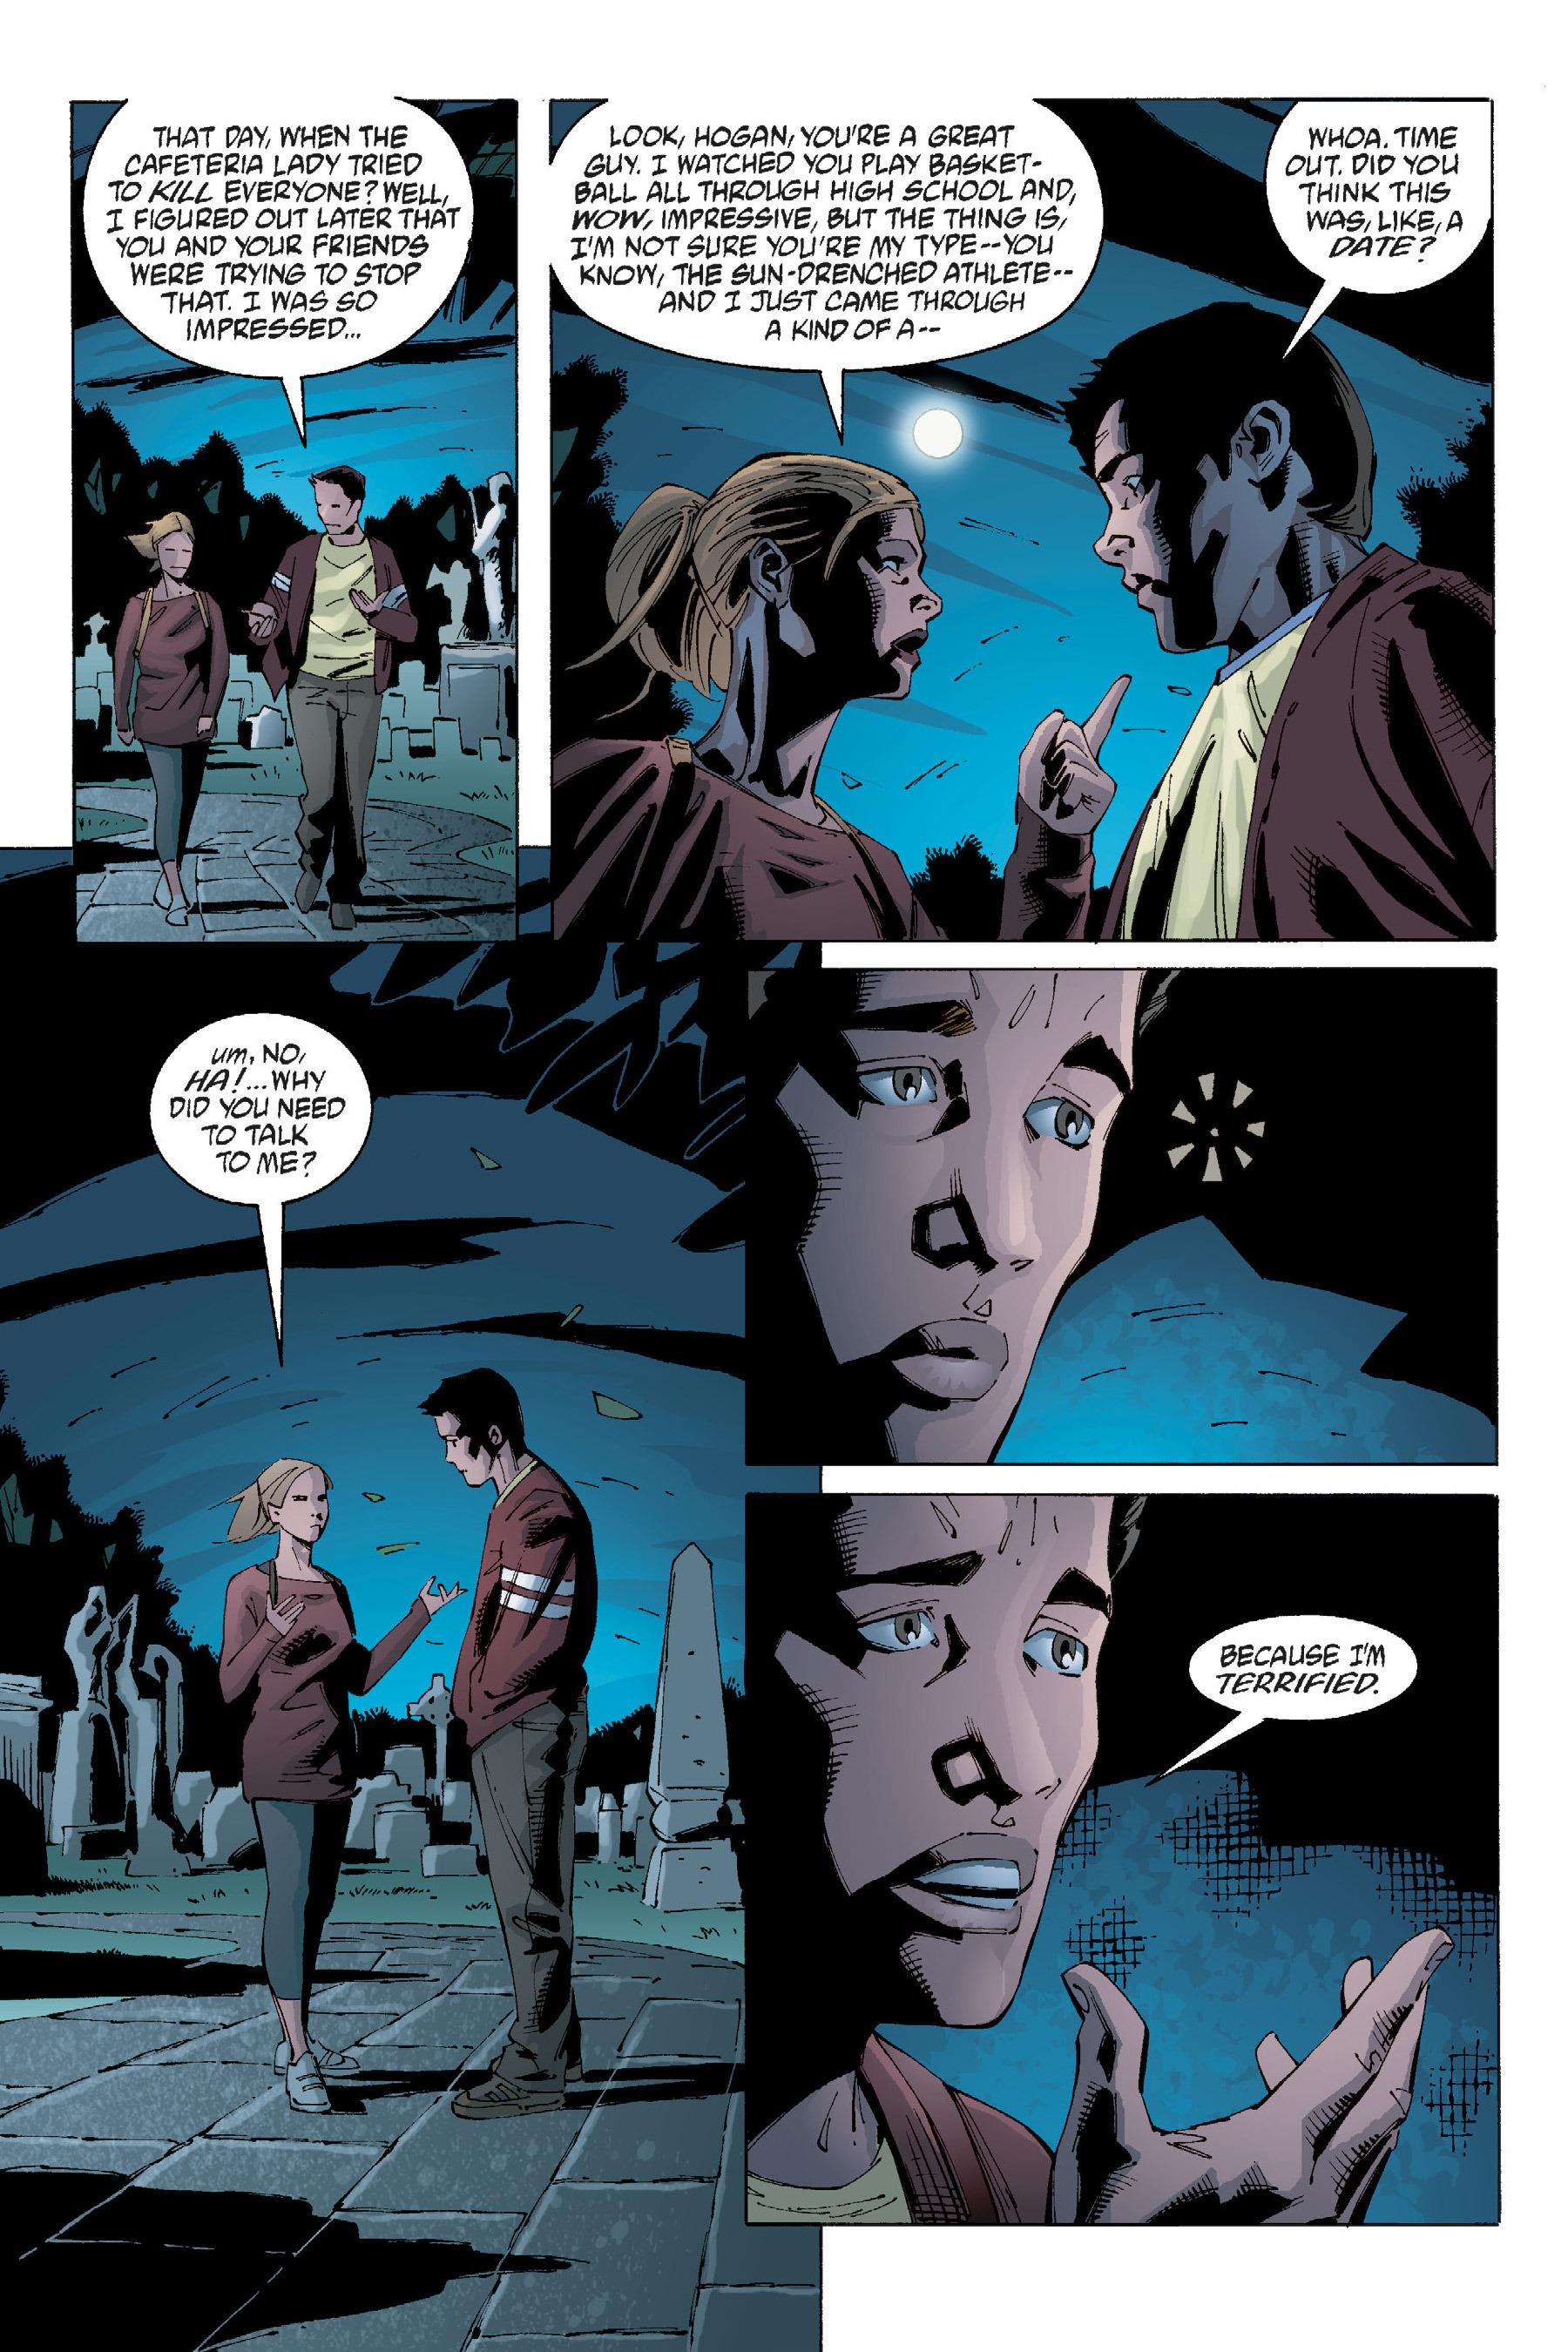 Read online Buffy the Vampire Slayer: Omnibus comic -  Issue # TPB 5 - 26